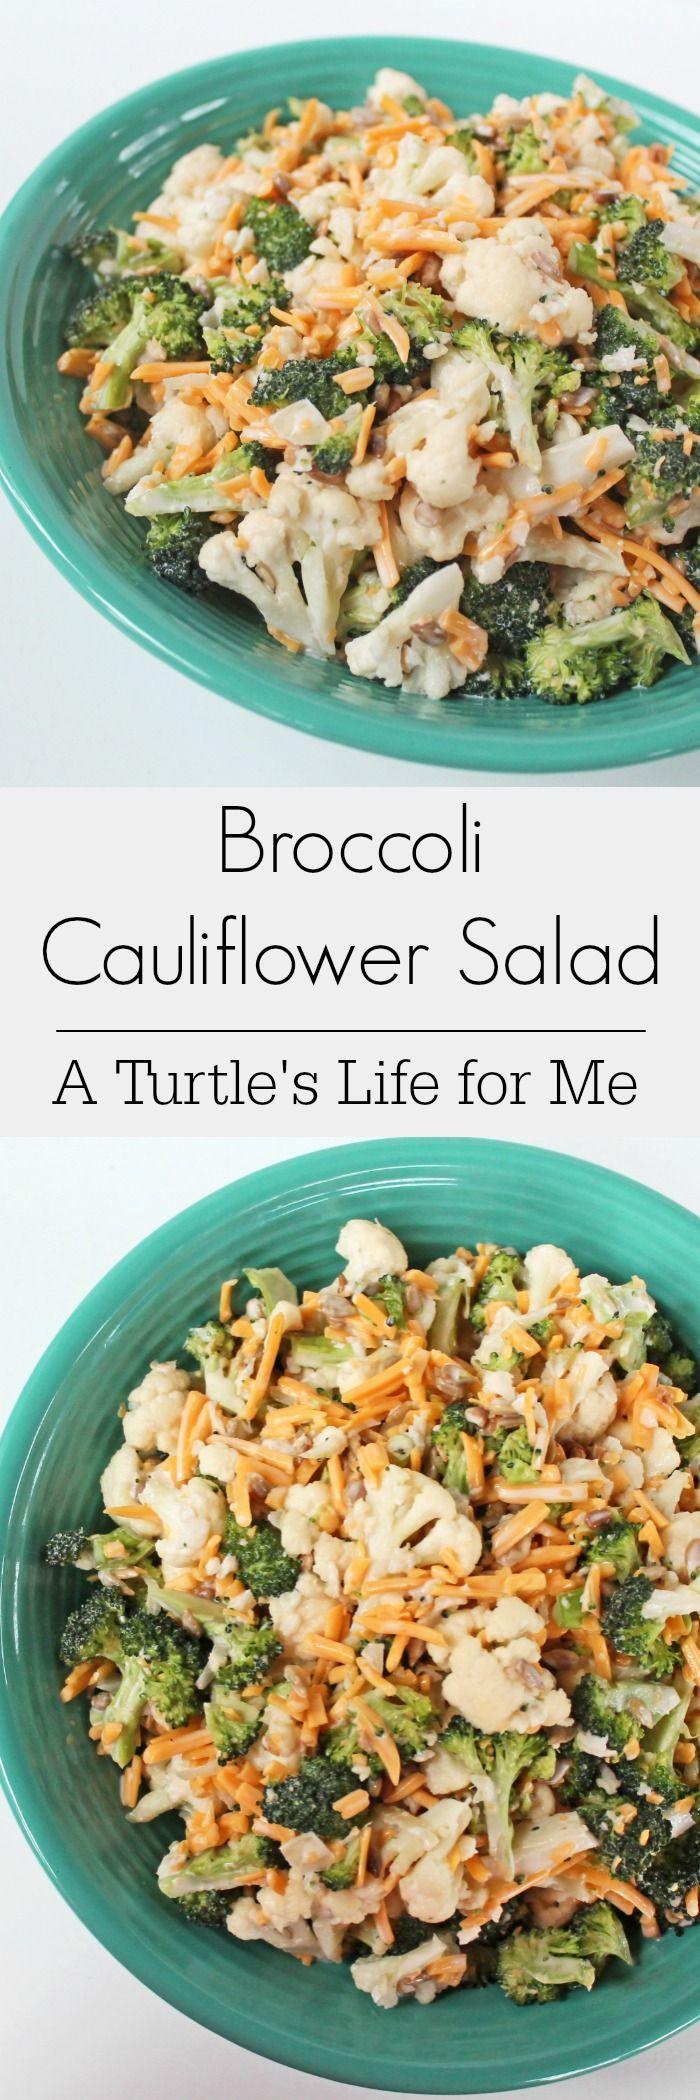 Broccoli Cauliflower Salad Recipe- A Turtle's Life for Me